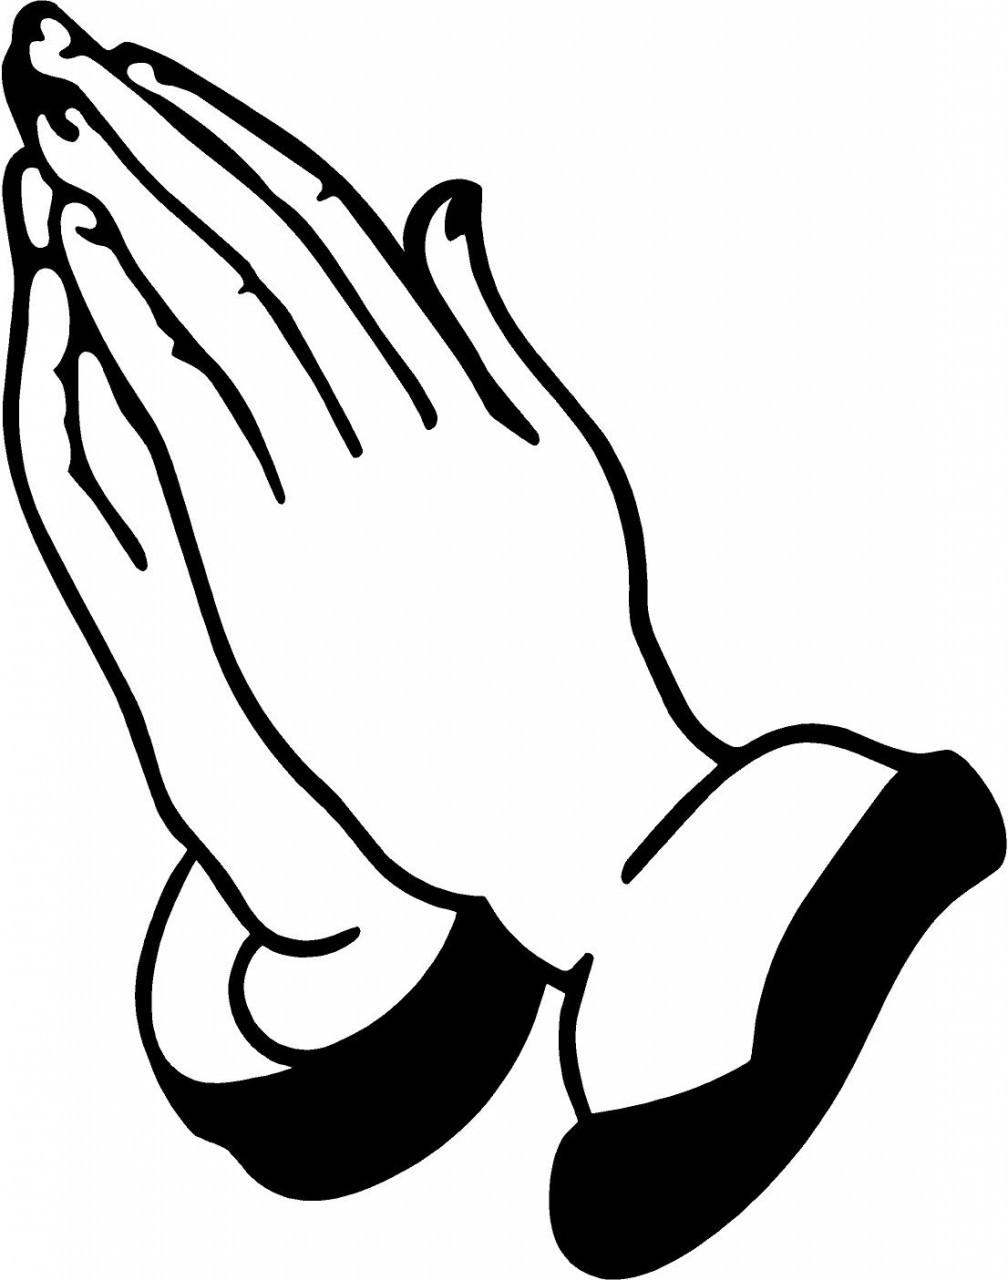 Praying hands praying hand prayer clipart image 9 2